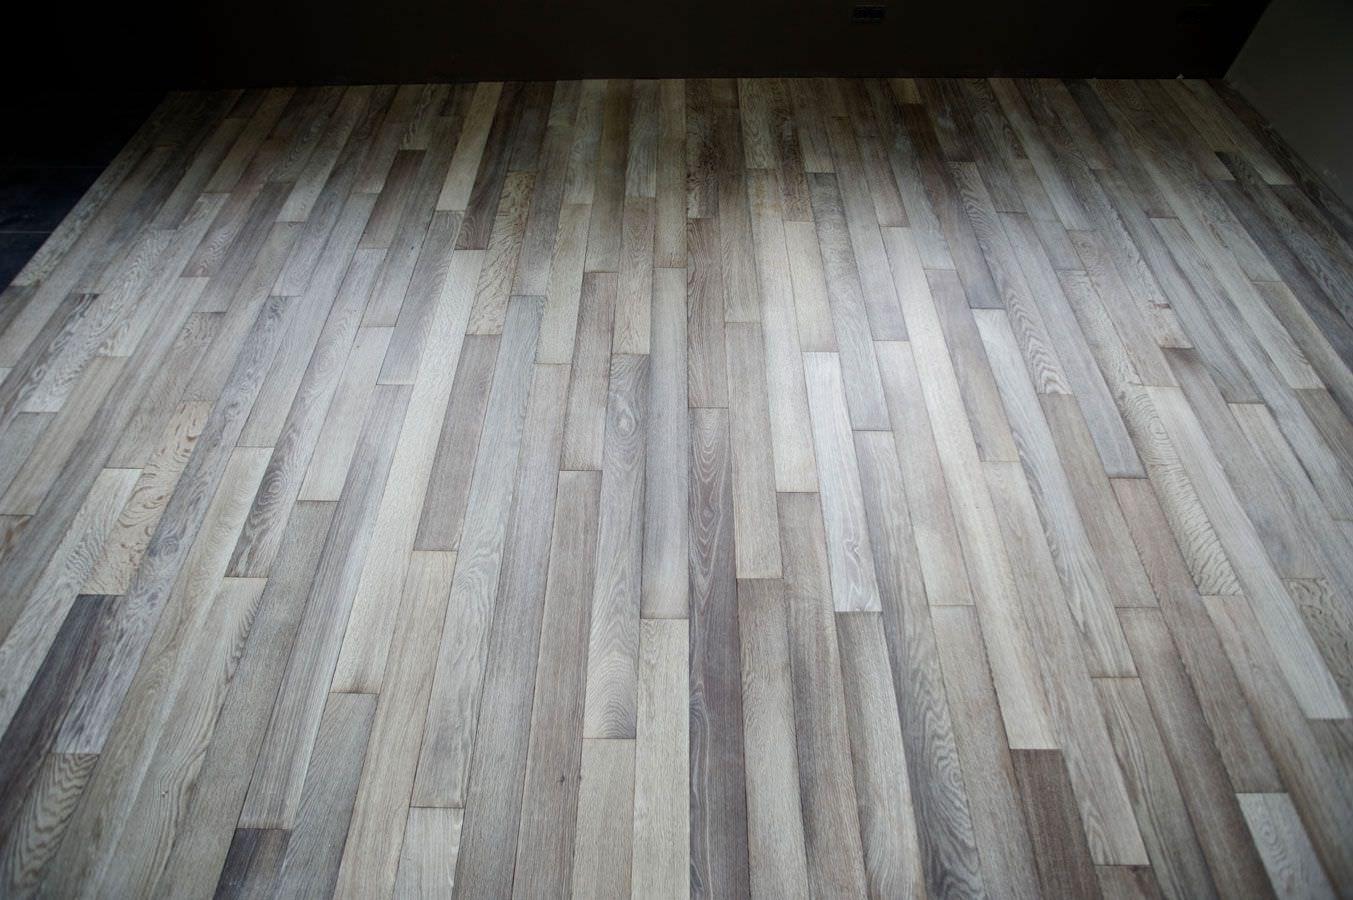 Traditional Look Grey Wood Stain House Decoration In 2020 Hardwood Floor Colors Hardwood Floors Gray Oak Floor